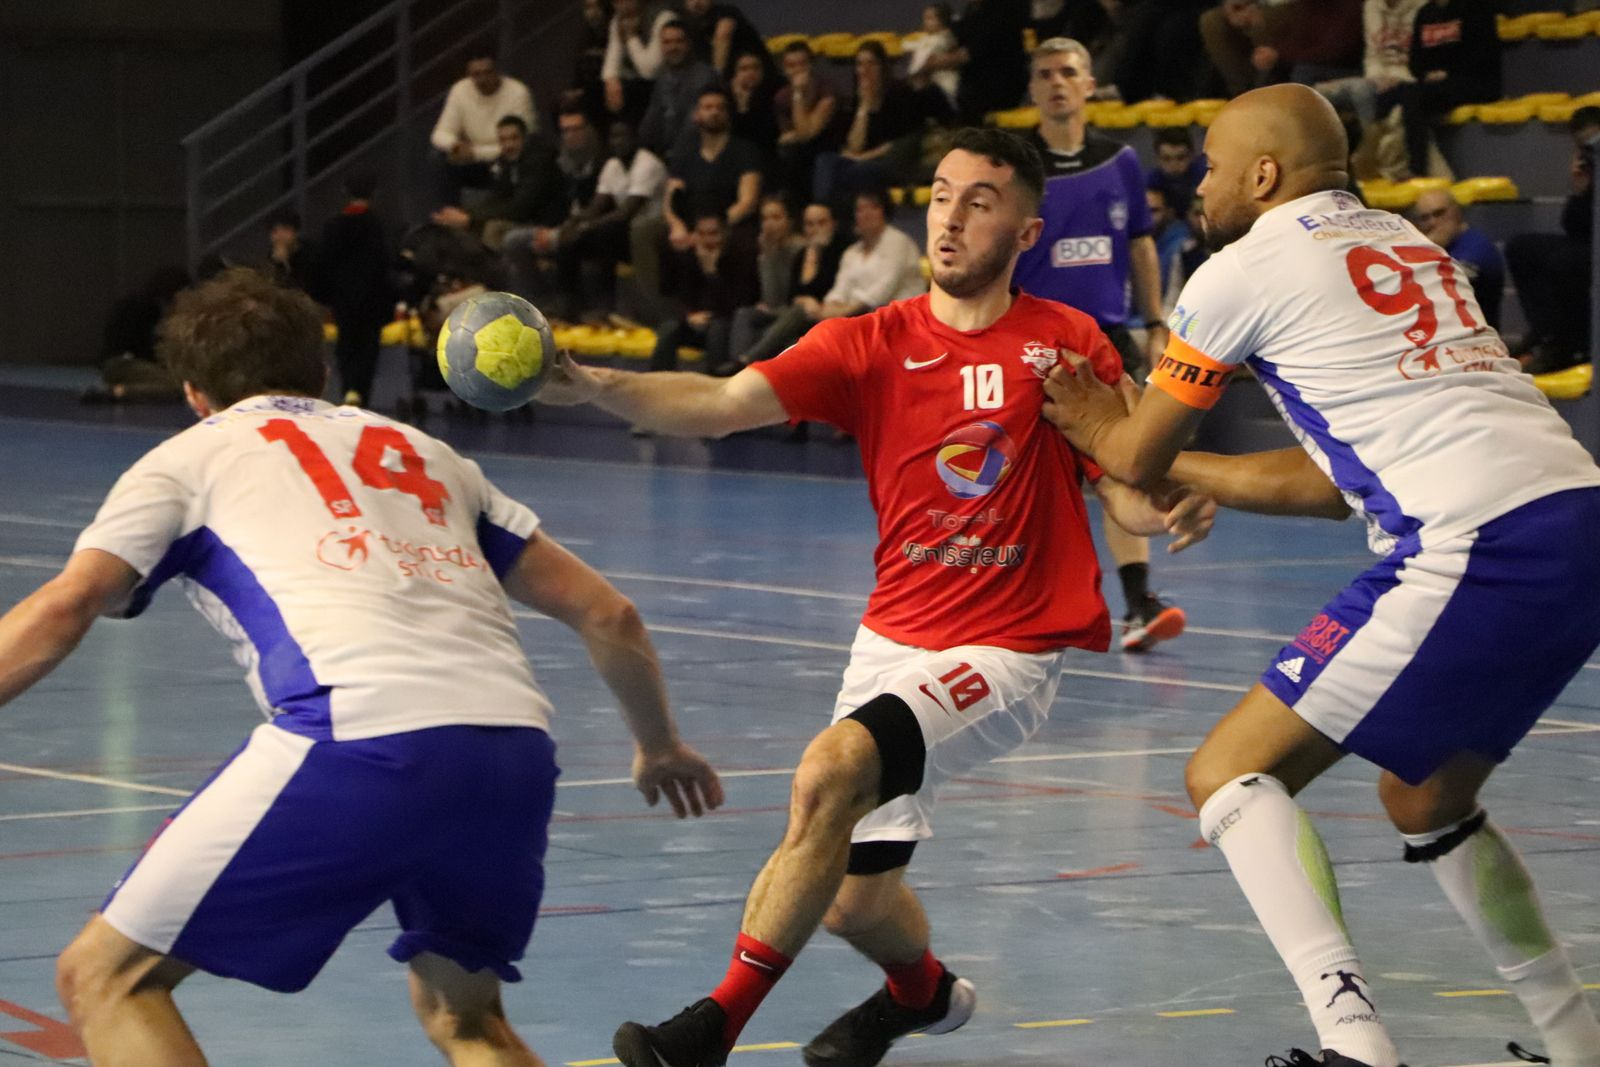 Le handball national reprendra à Vénissieux le 19 septembre